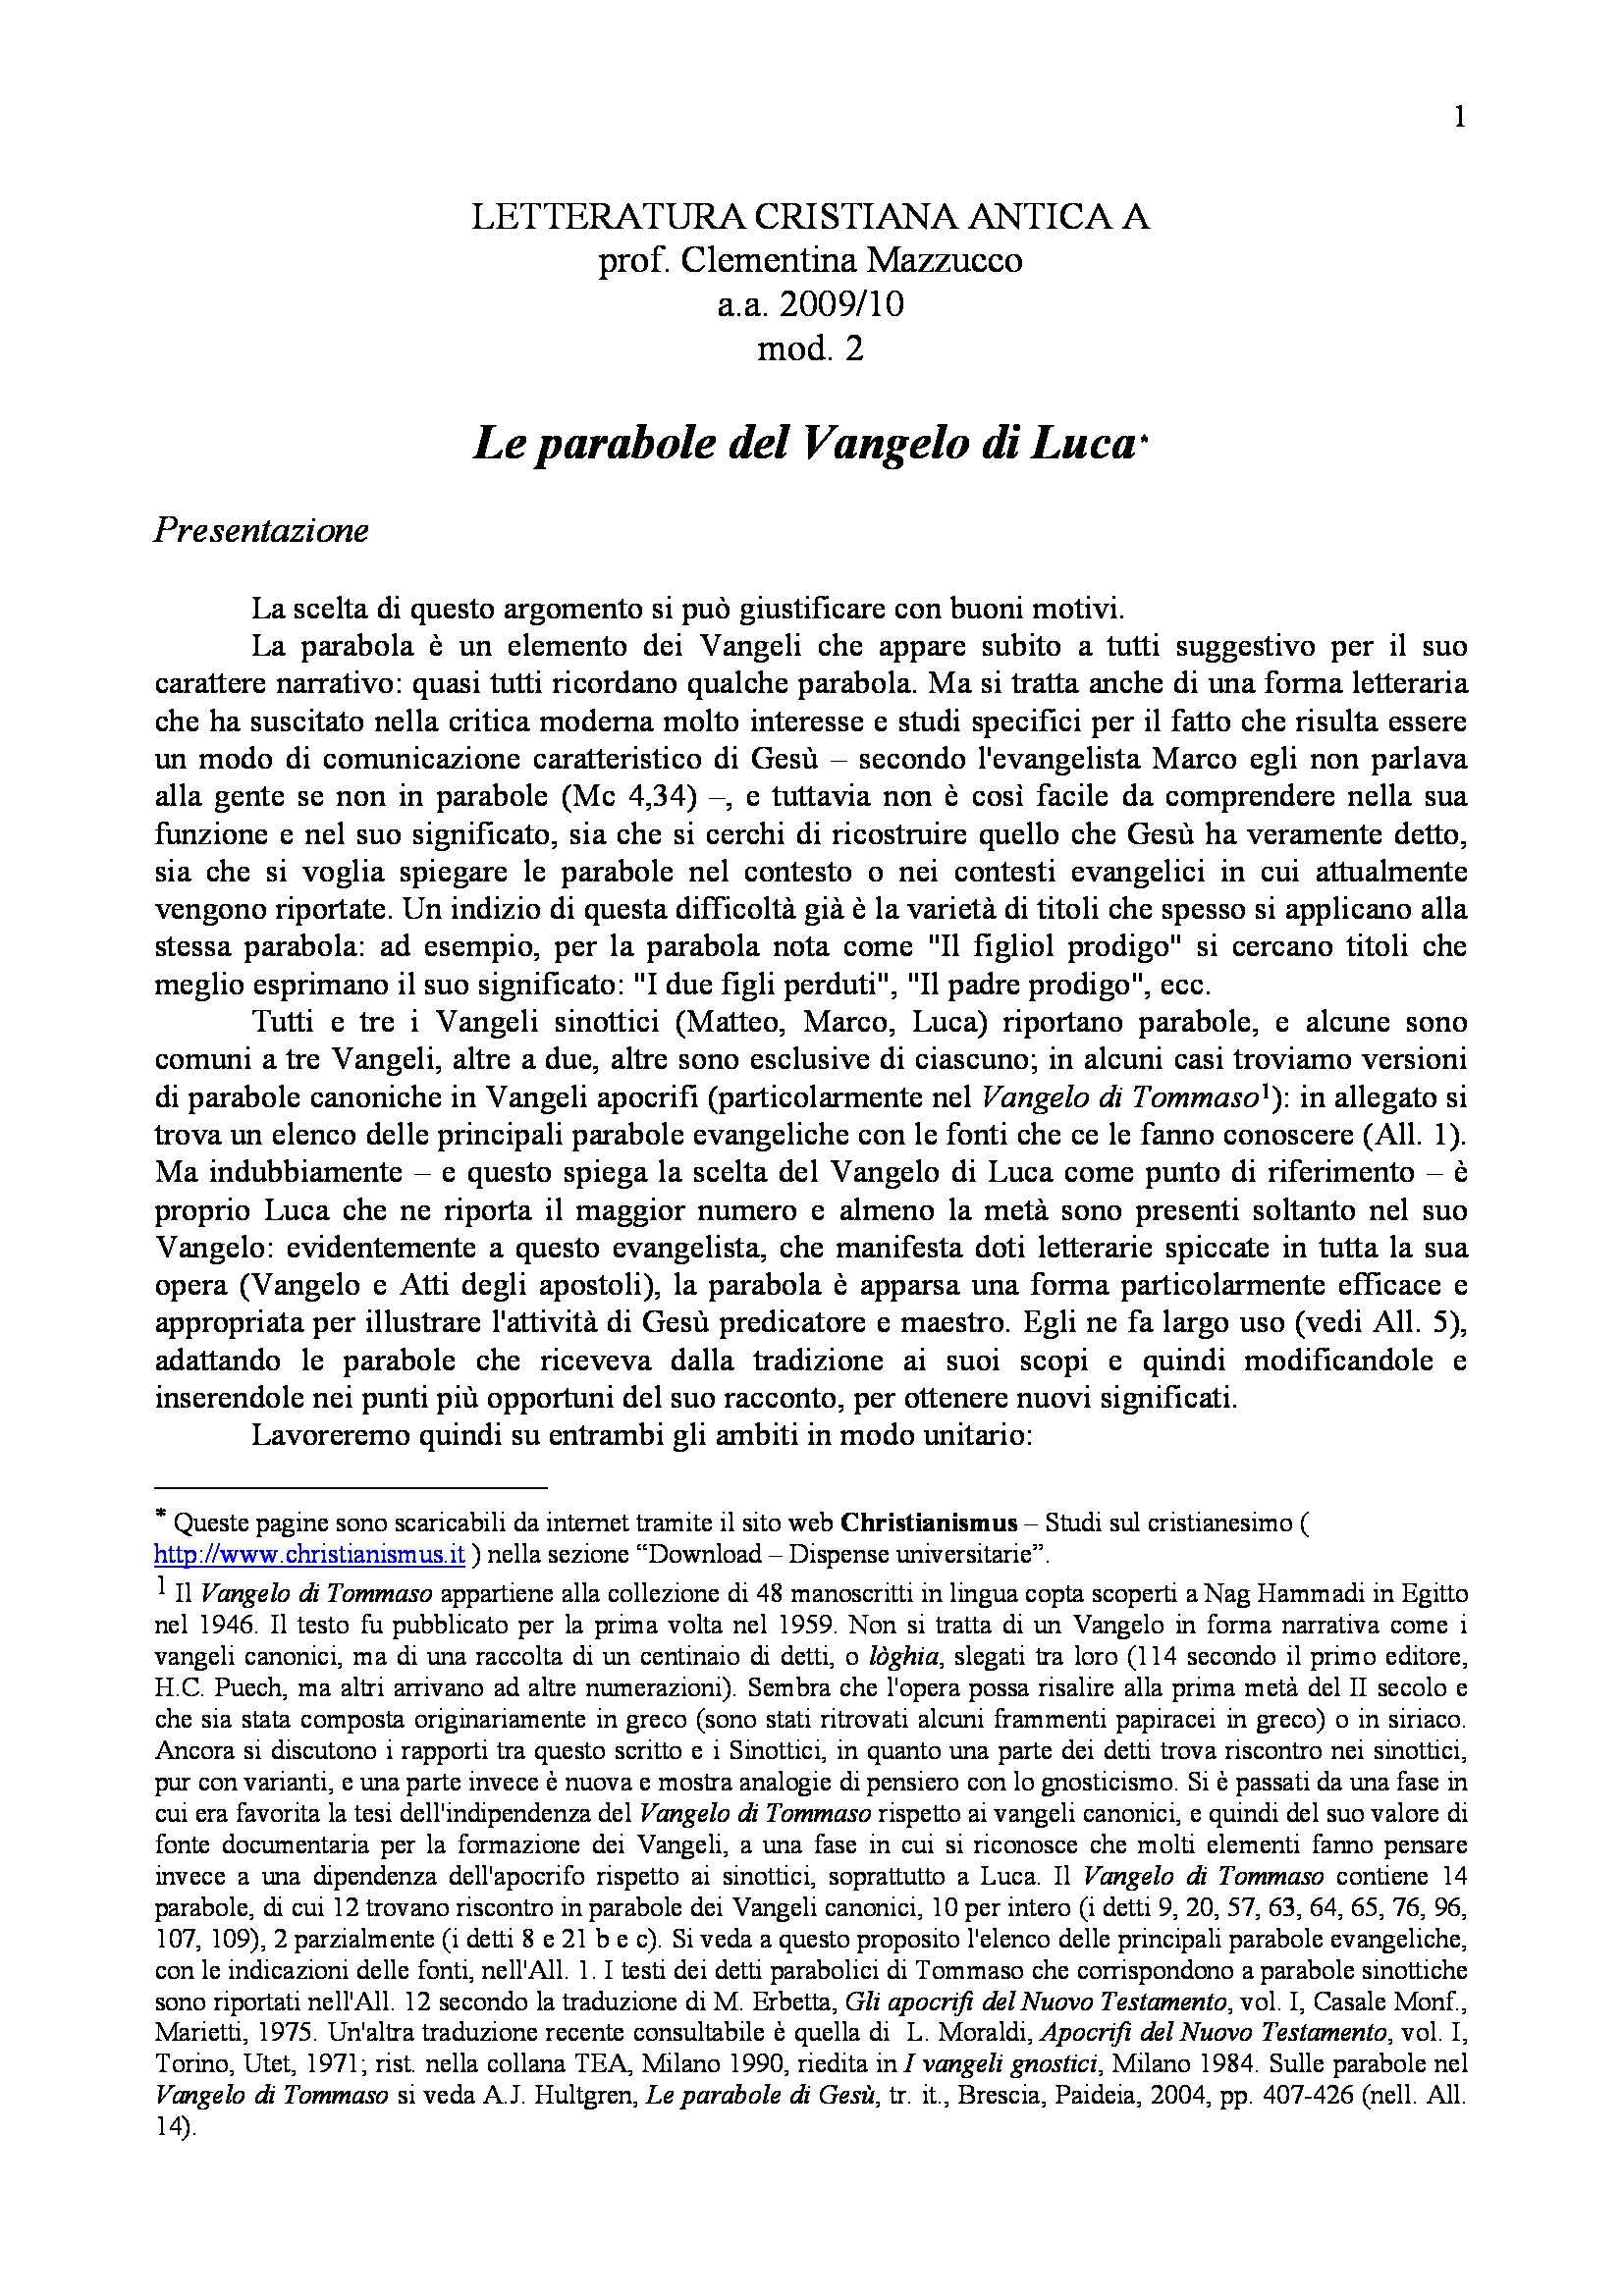 Parabole del Vangelo di Luca